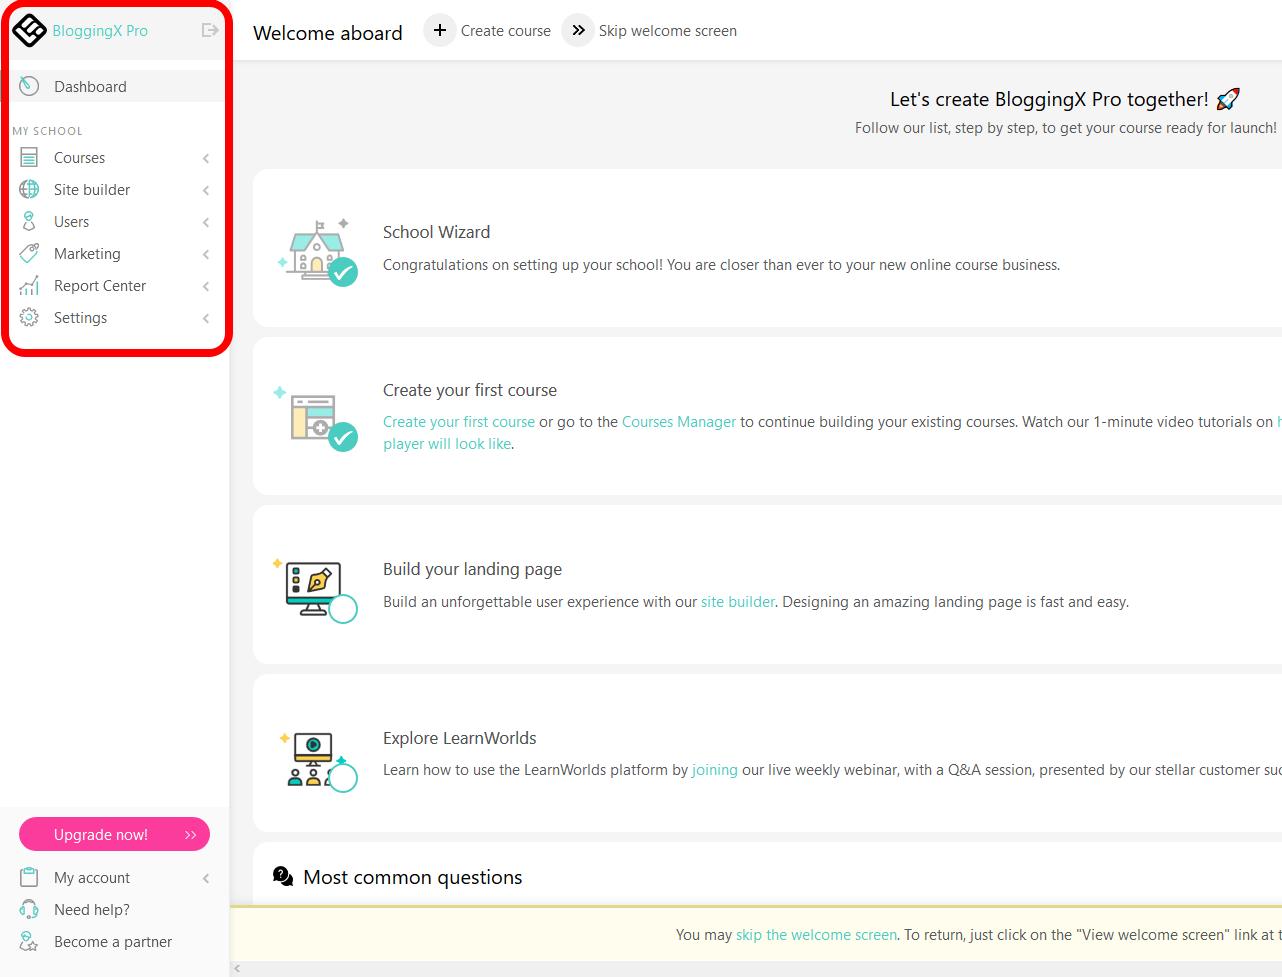 LearnWorlds interface